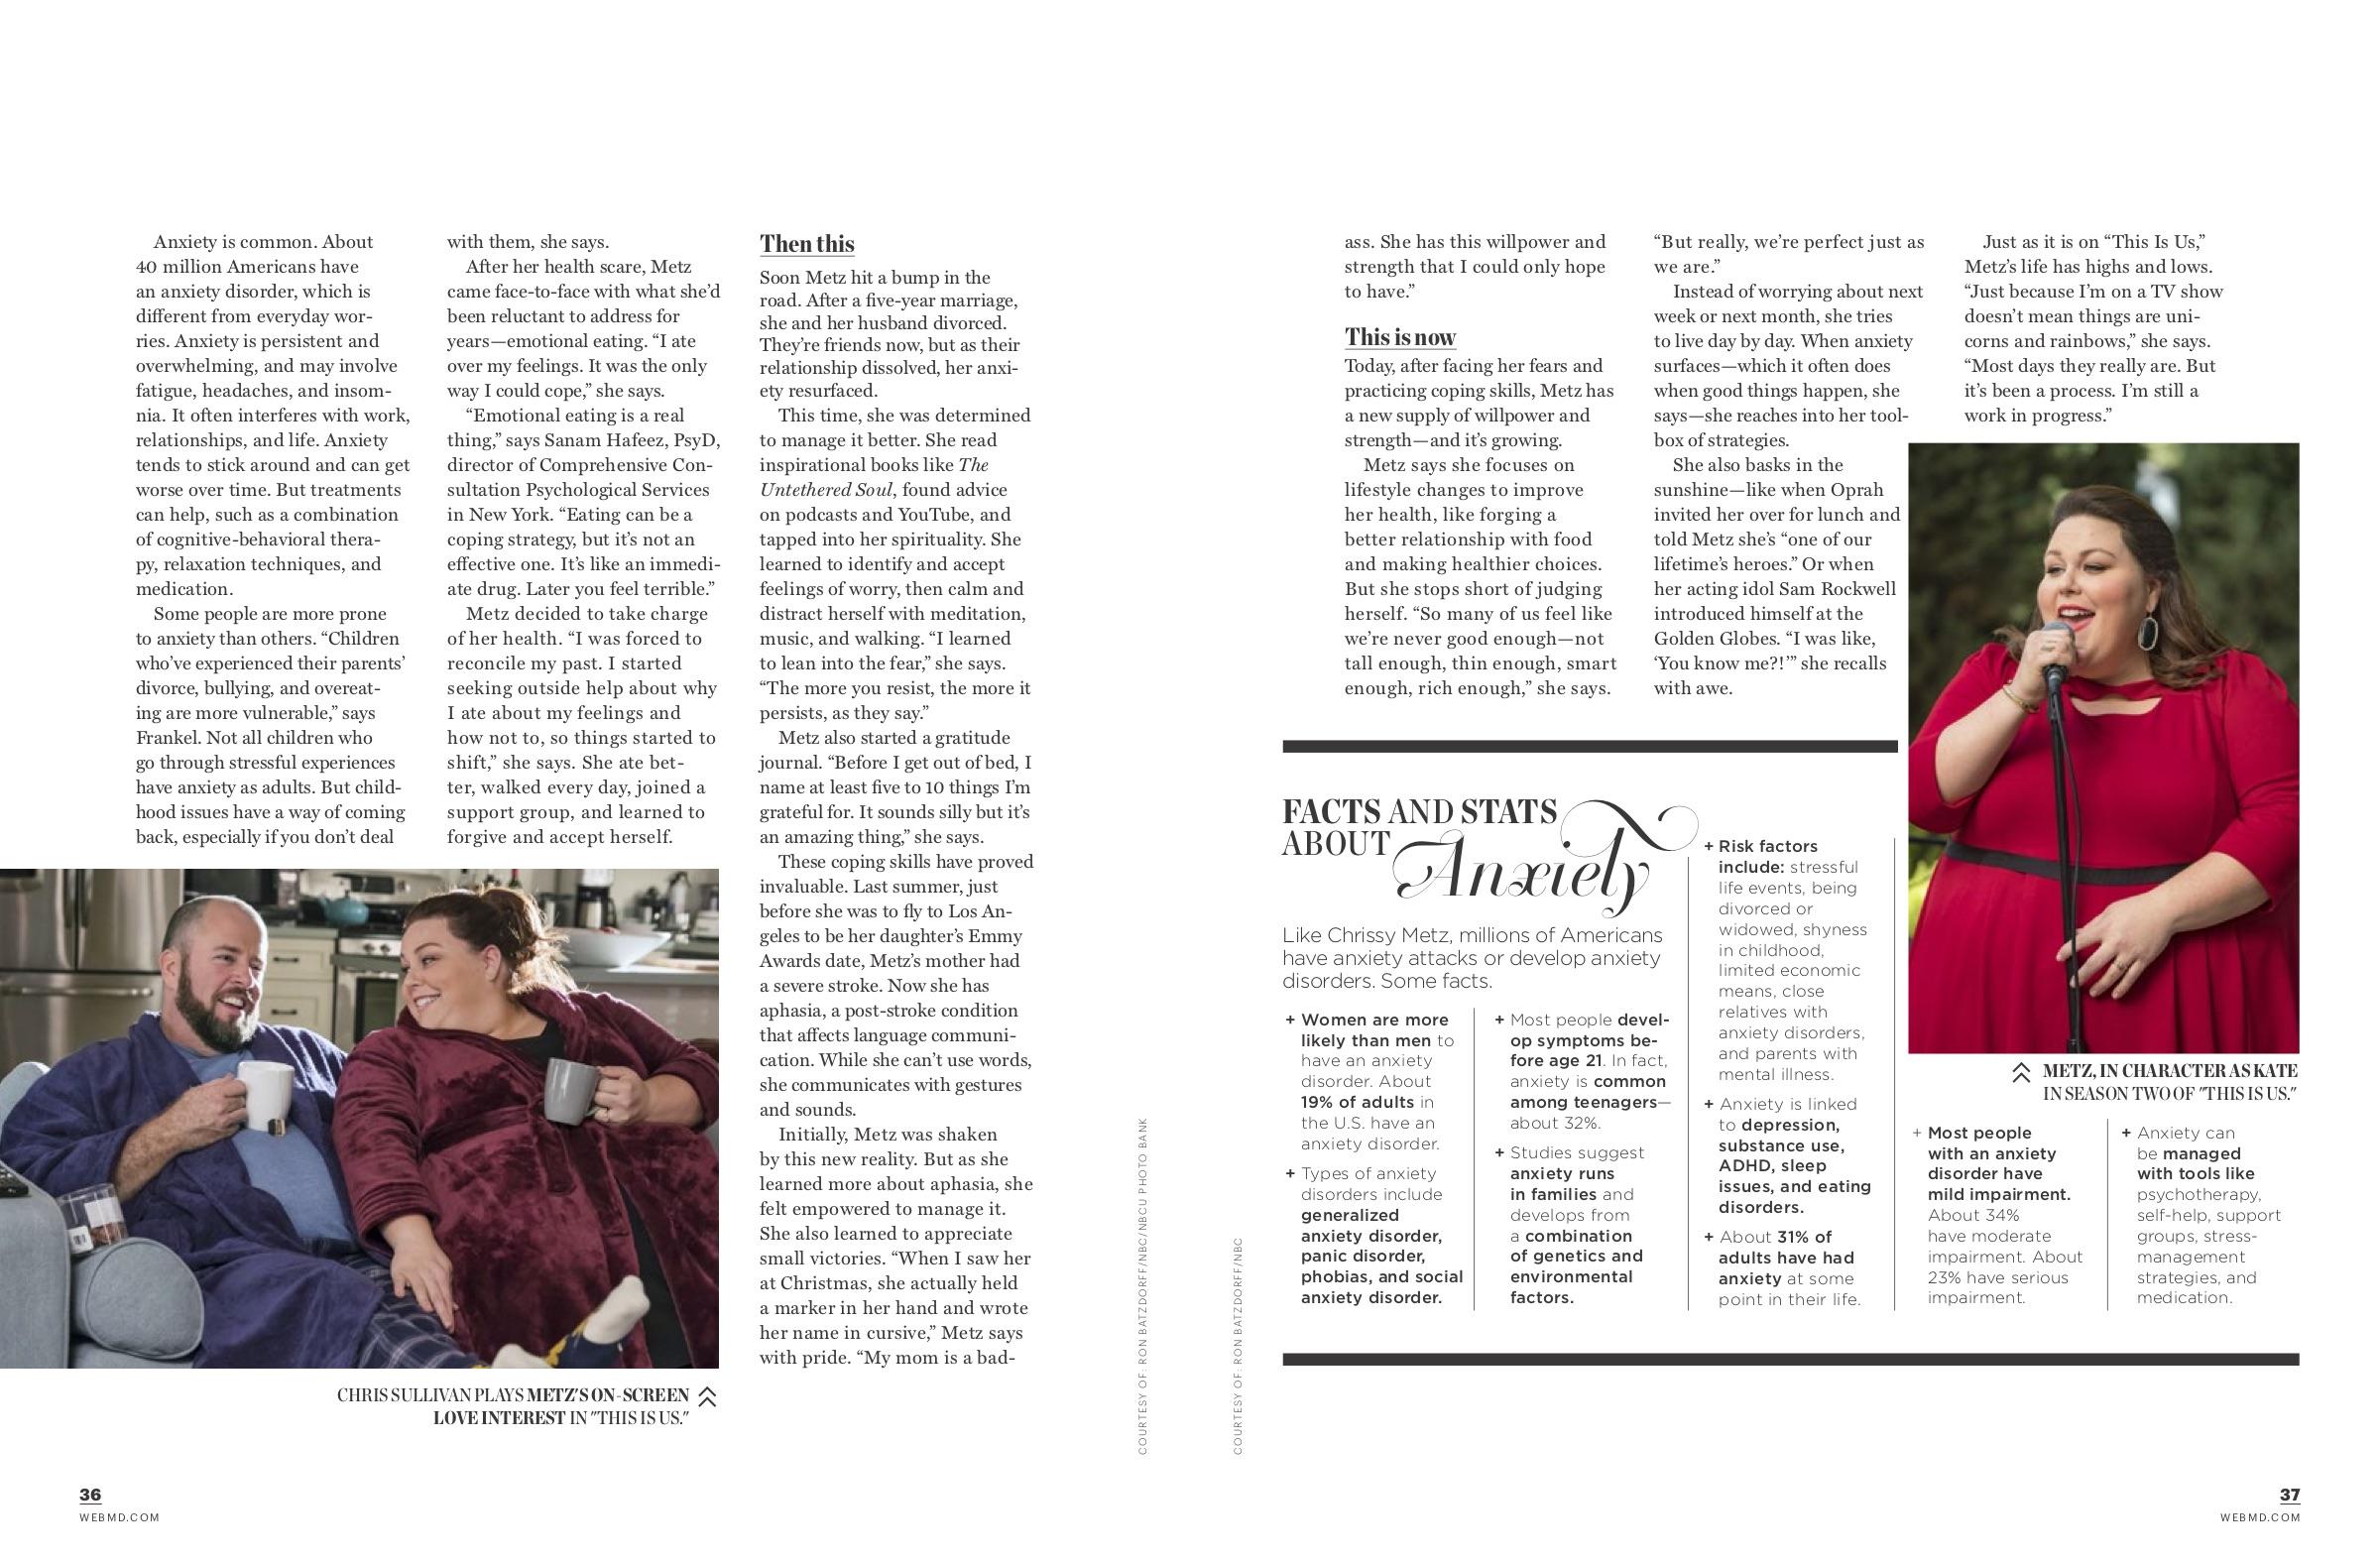 Chrissy Metz page 3.jpg